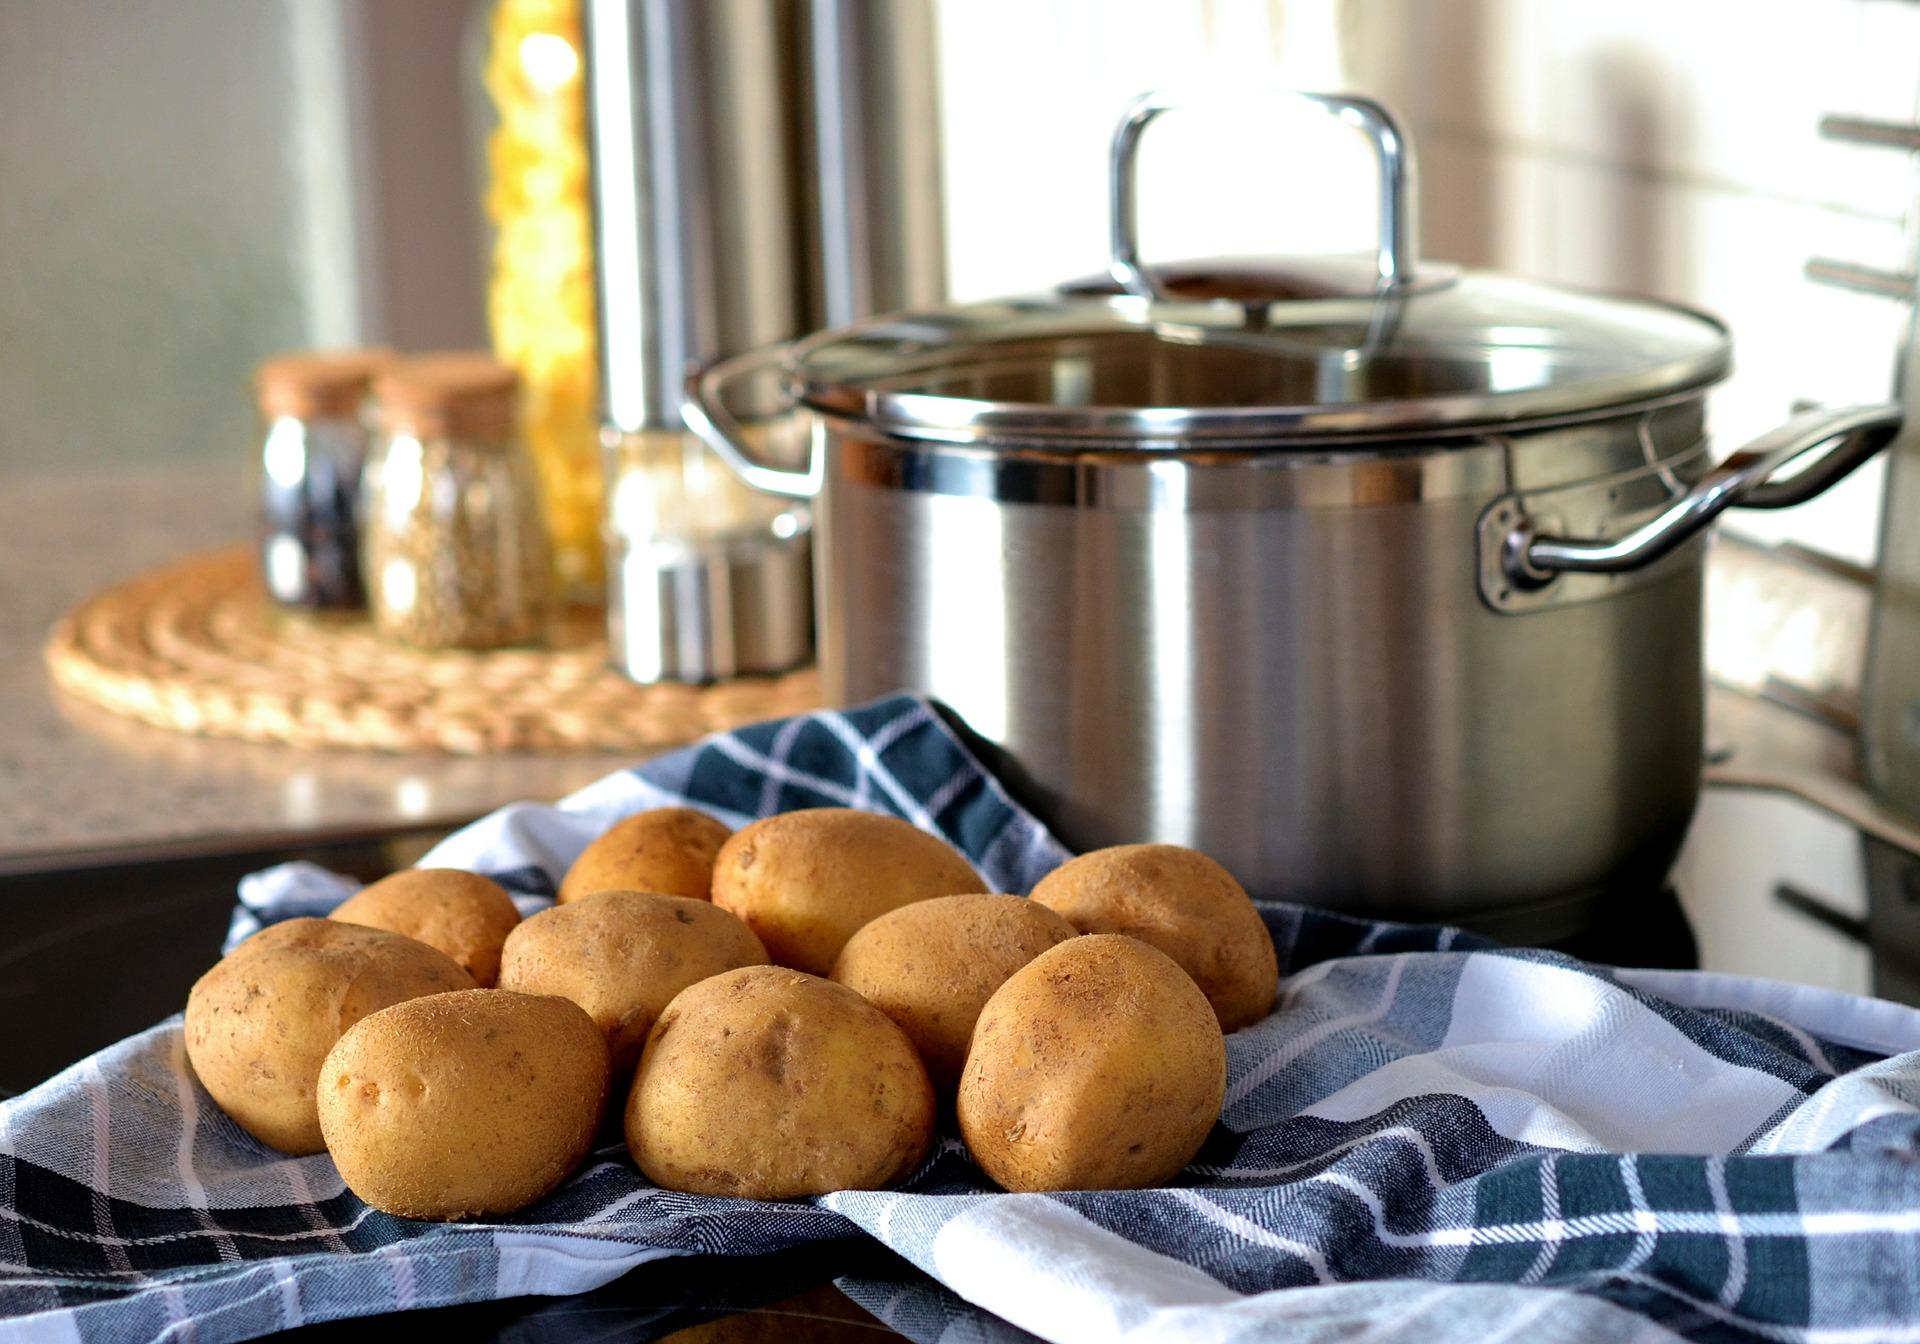 patate lesse cipolle e olive ricetta